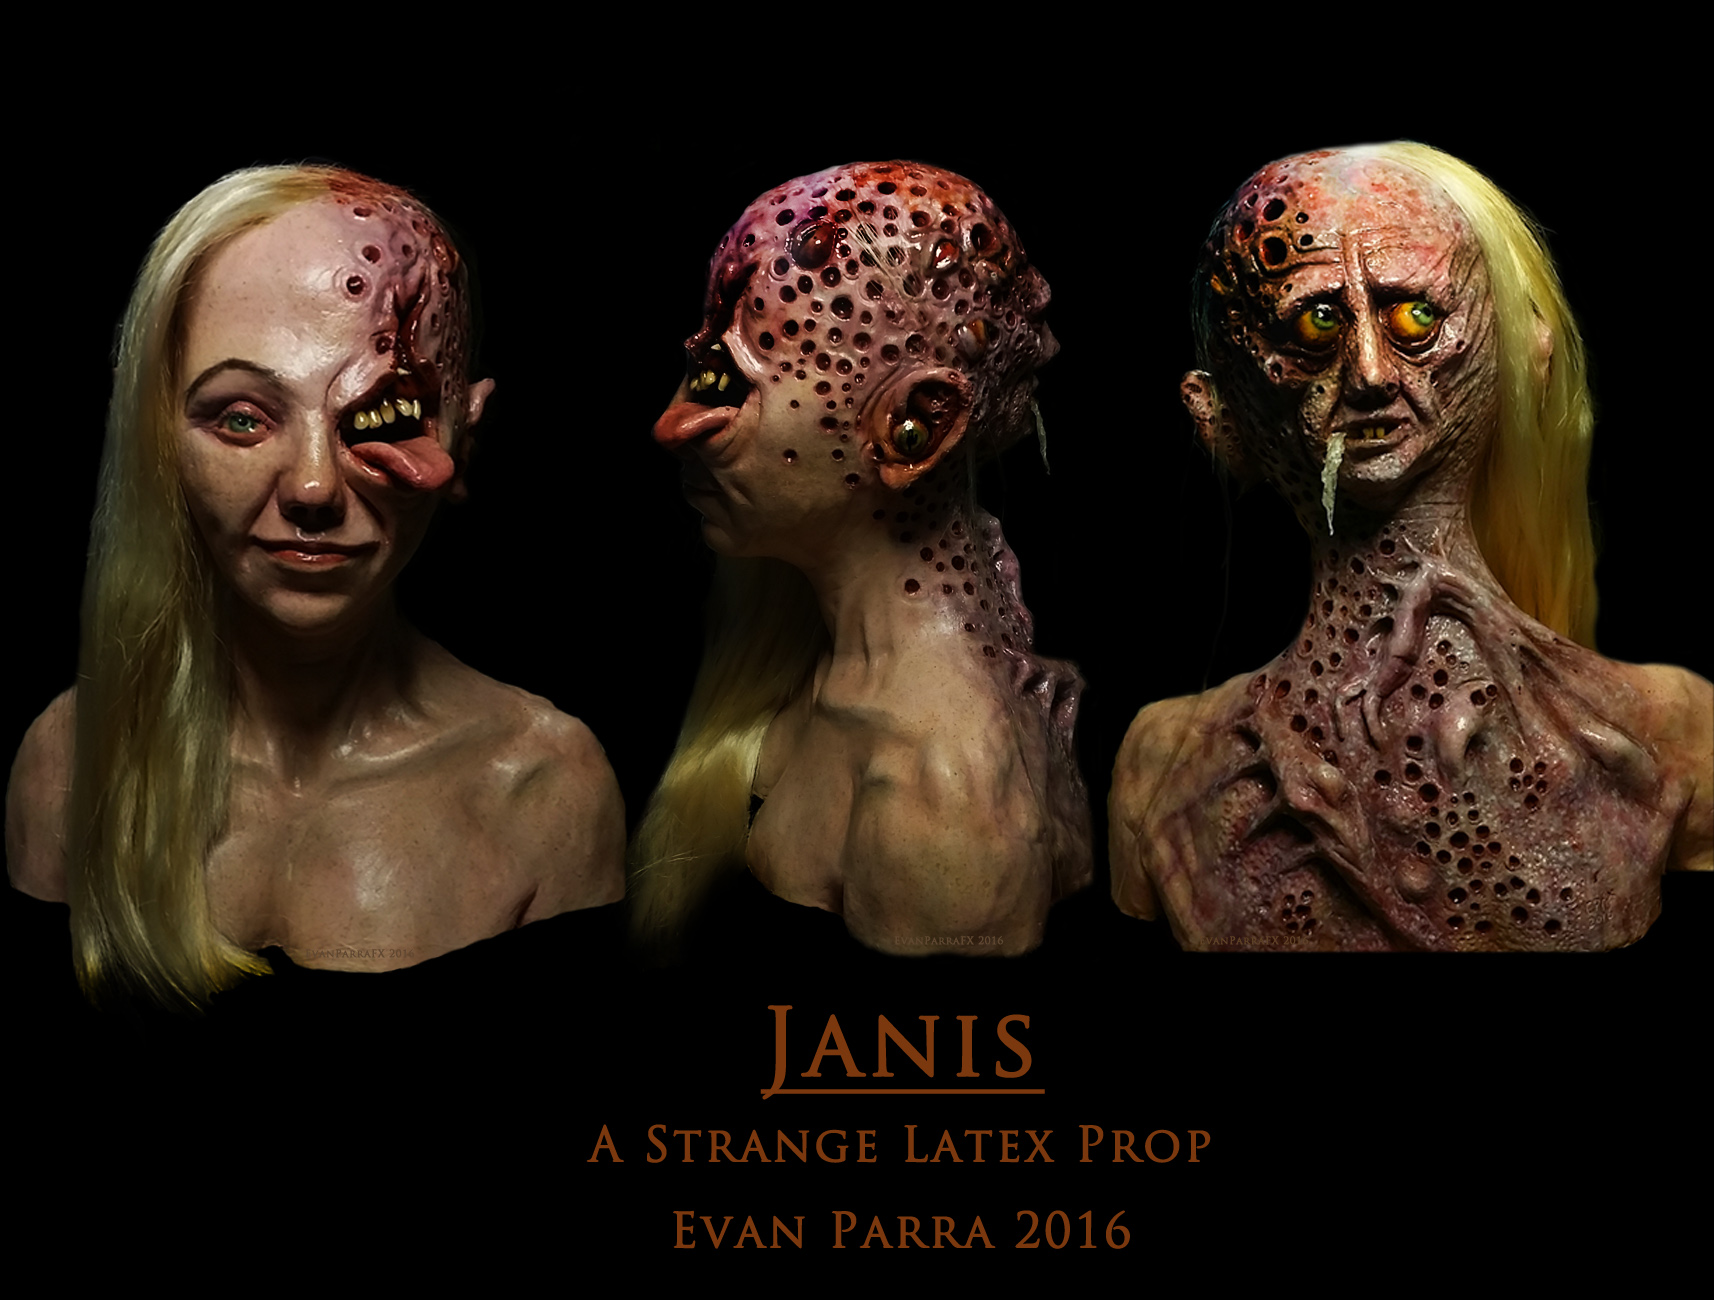 Janis - A Strange Latex Prop